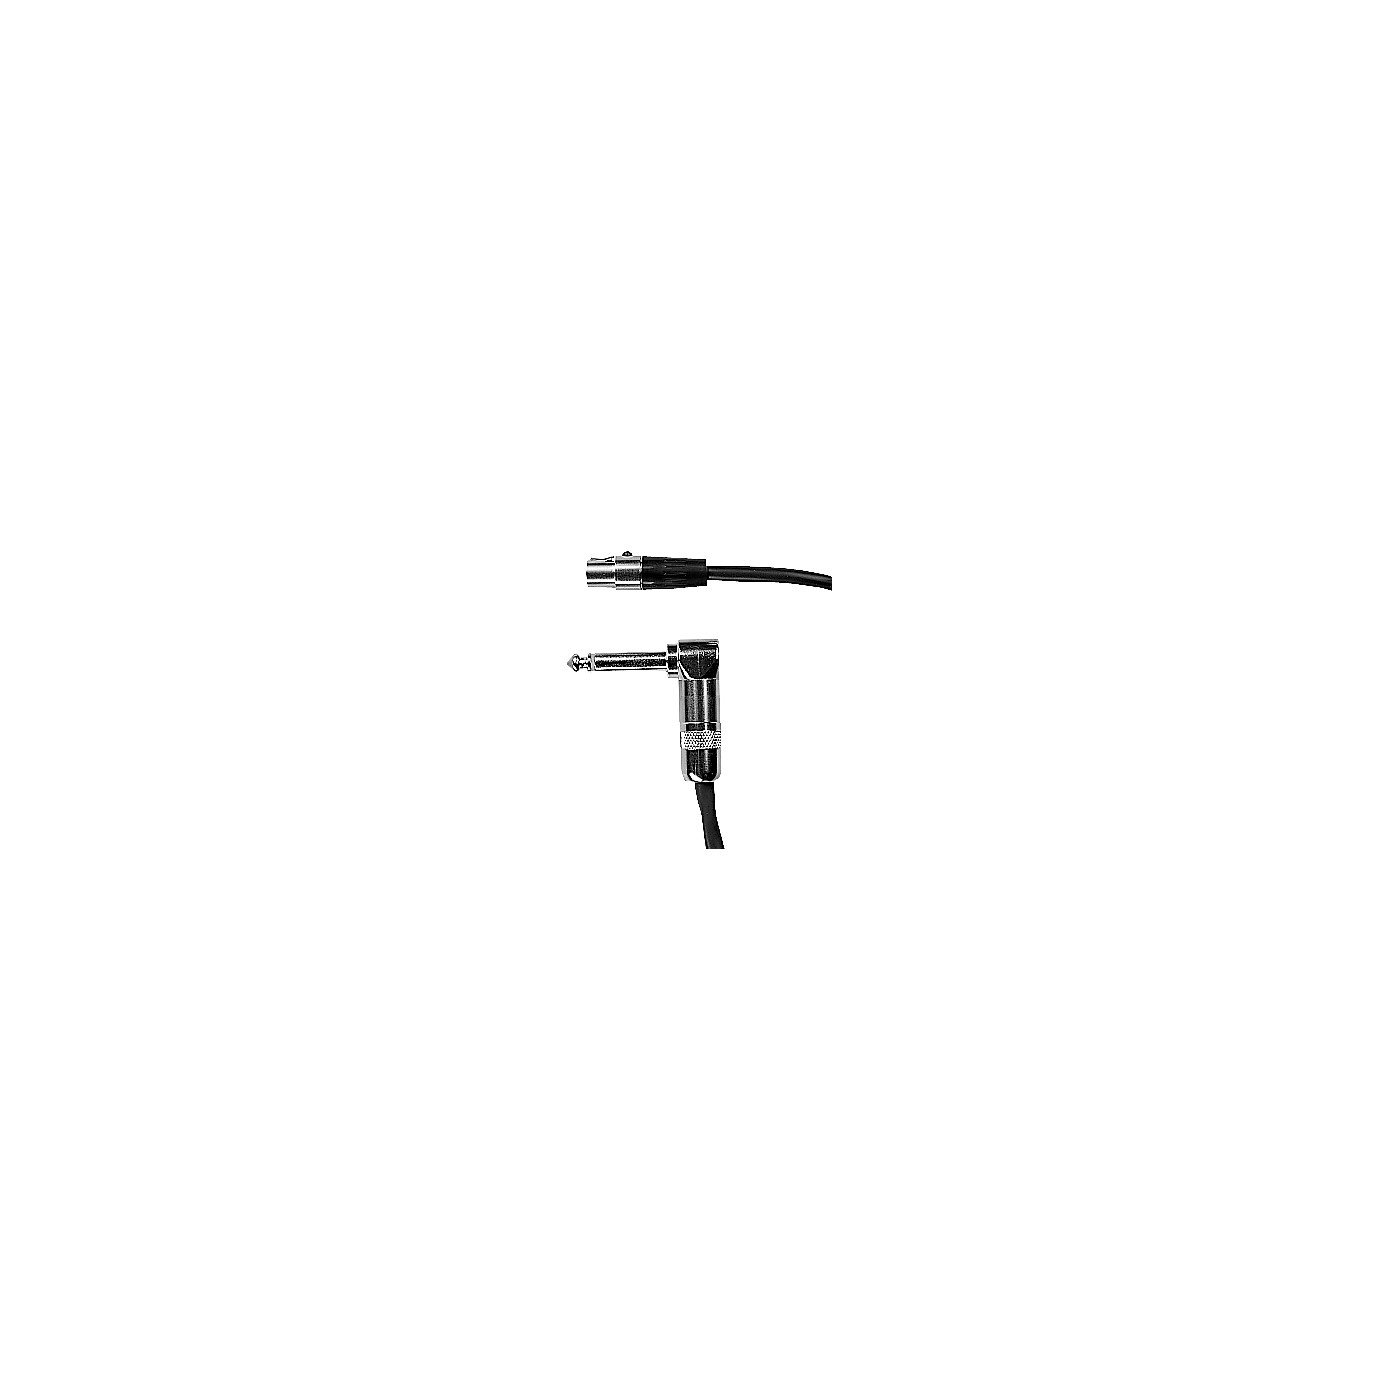 Shure WA-304 Instrument Cable thumbnail